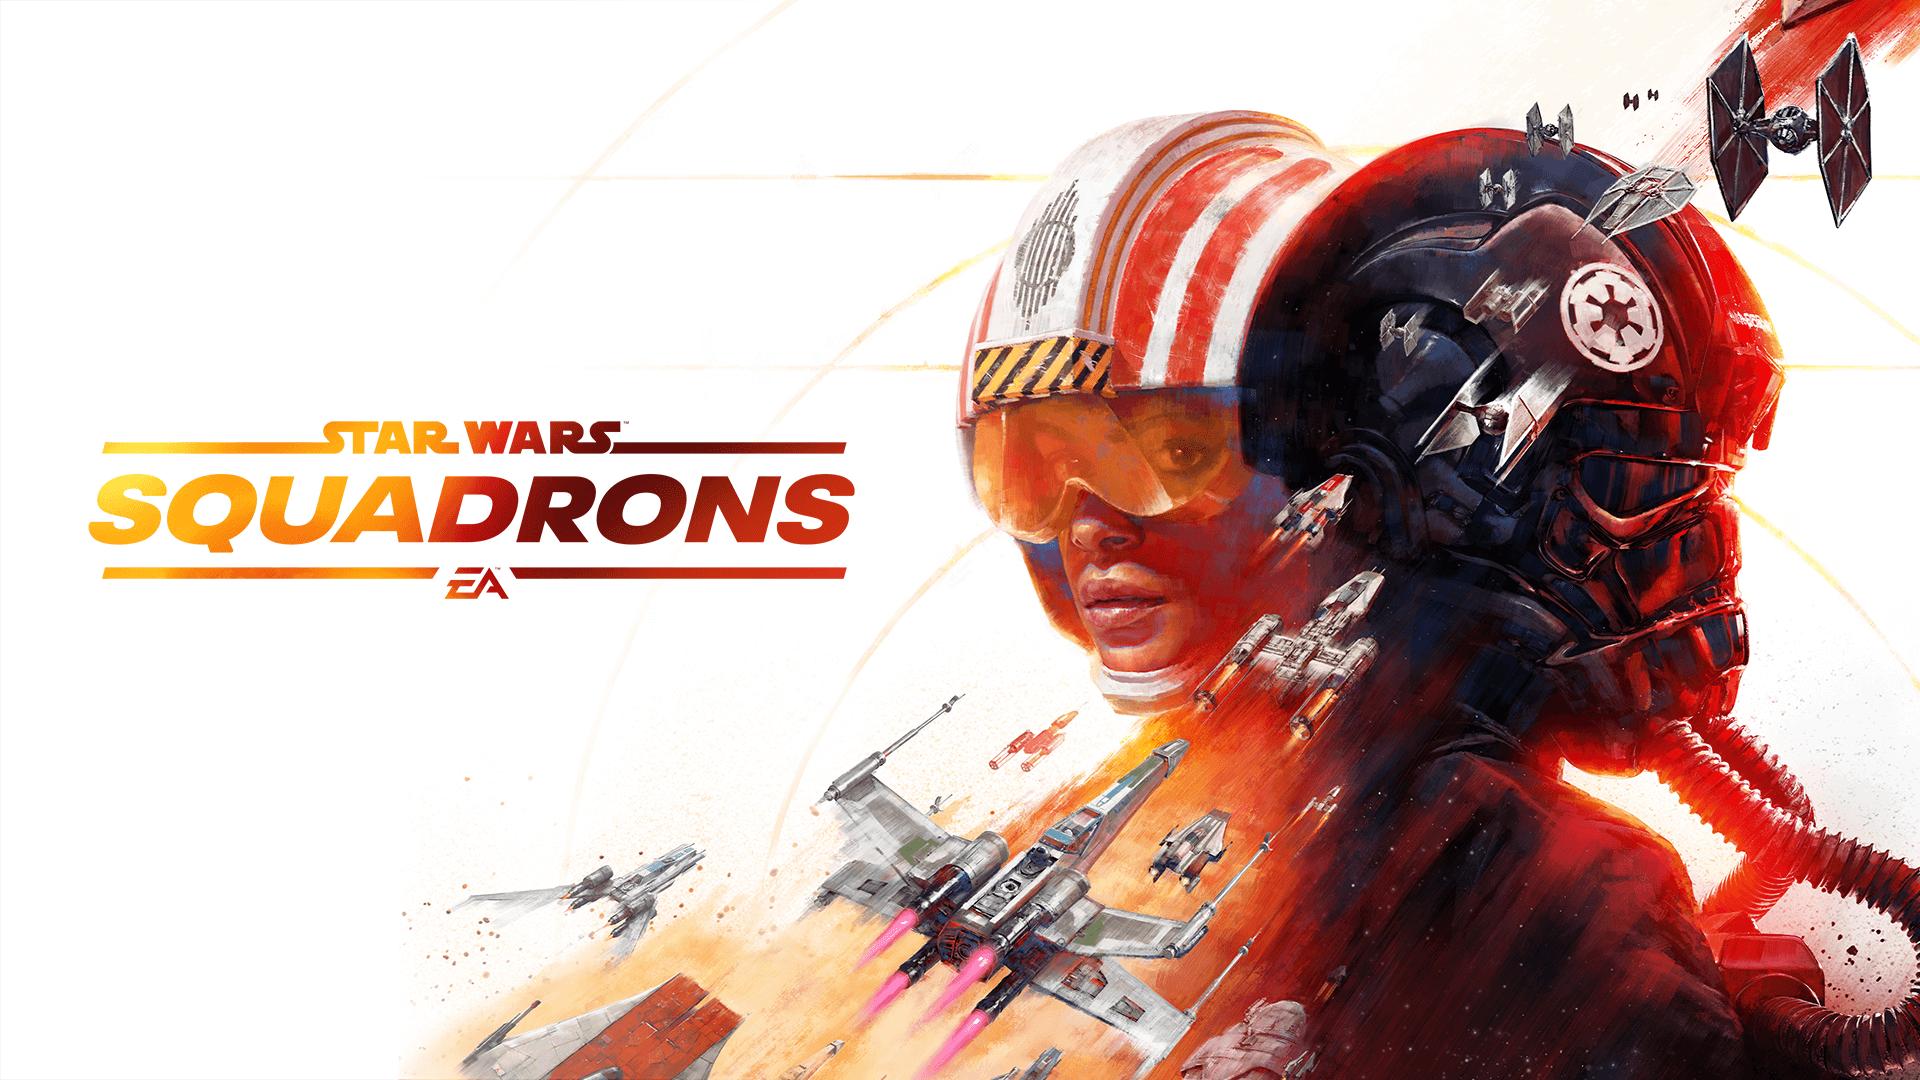 STAR WARS Squadrons ОФФЛАЙН АКТИВАЦИЯ, со скидкой,  denuvo [Ручная активация Origin] (RUS)